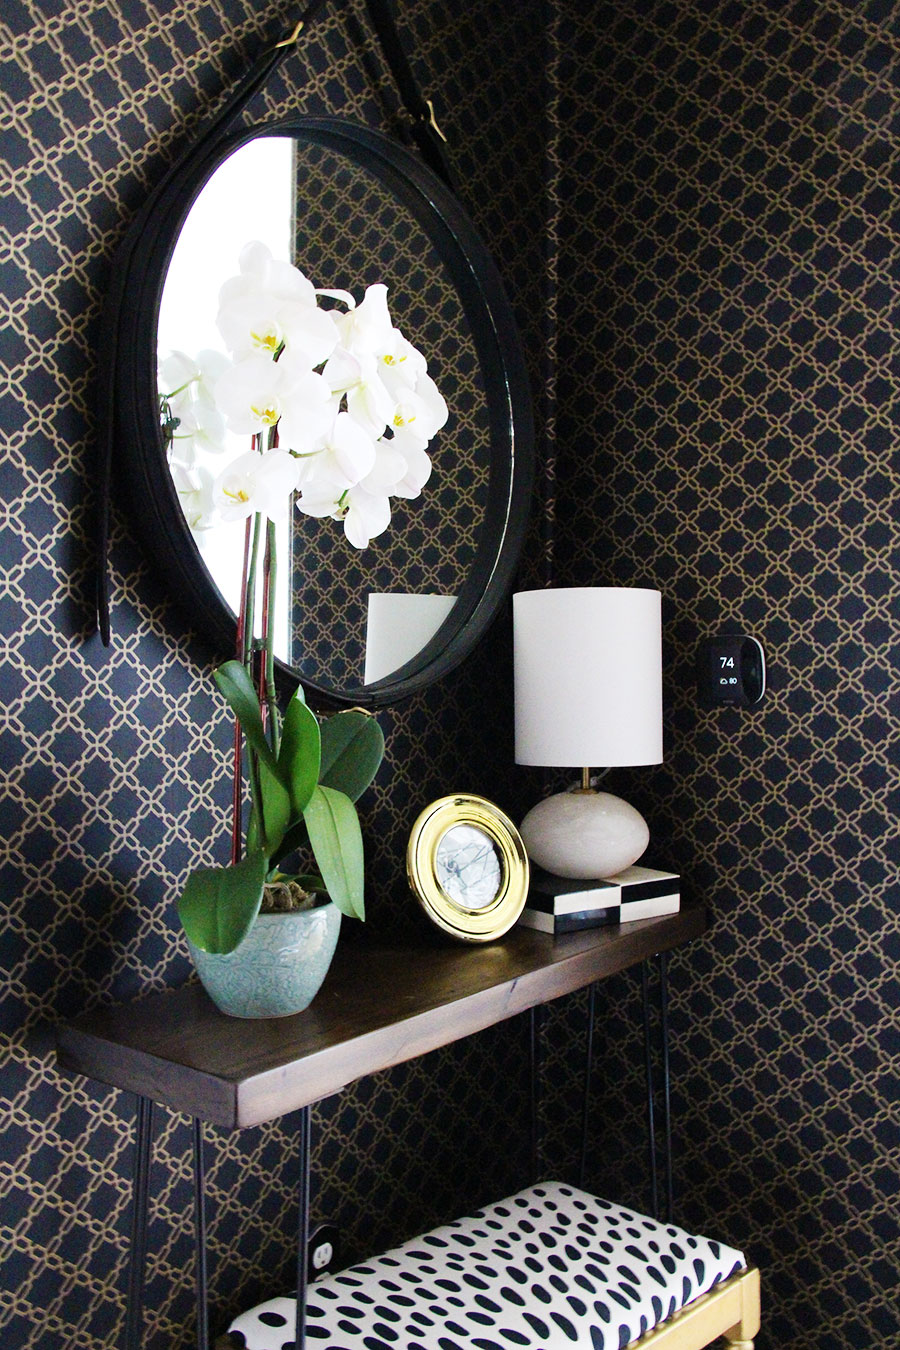 mariella-cruzado-wallpaper-dc-designer-decorator-splendor-styling